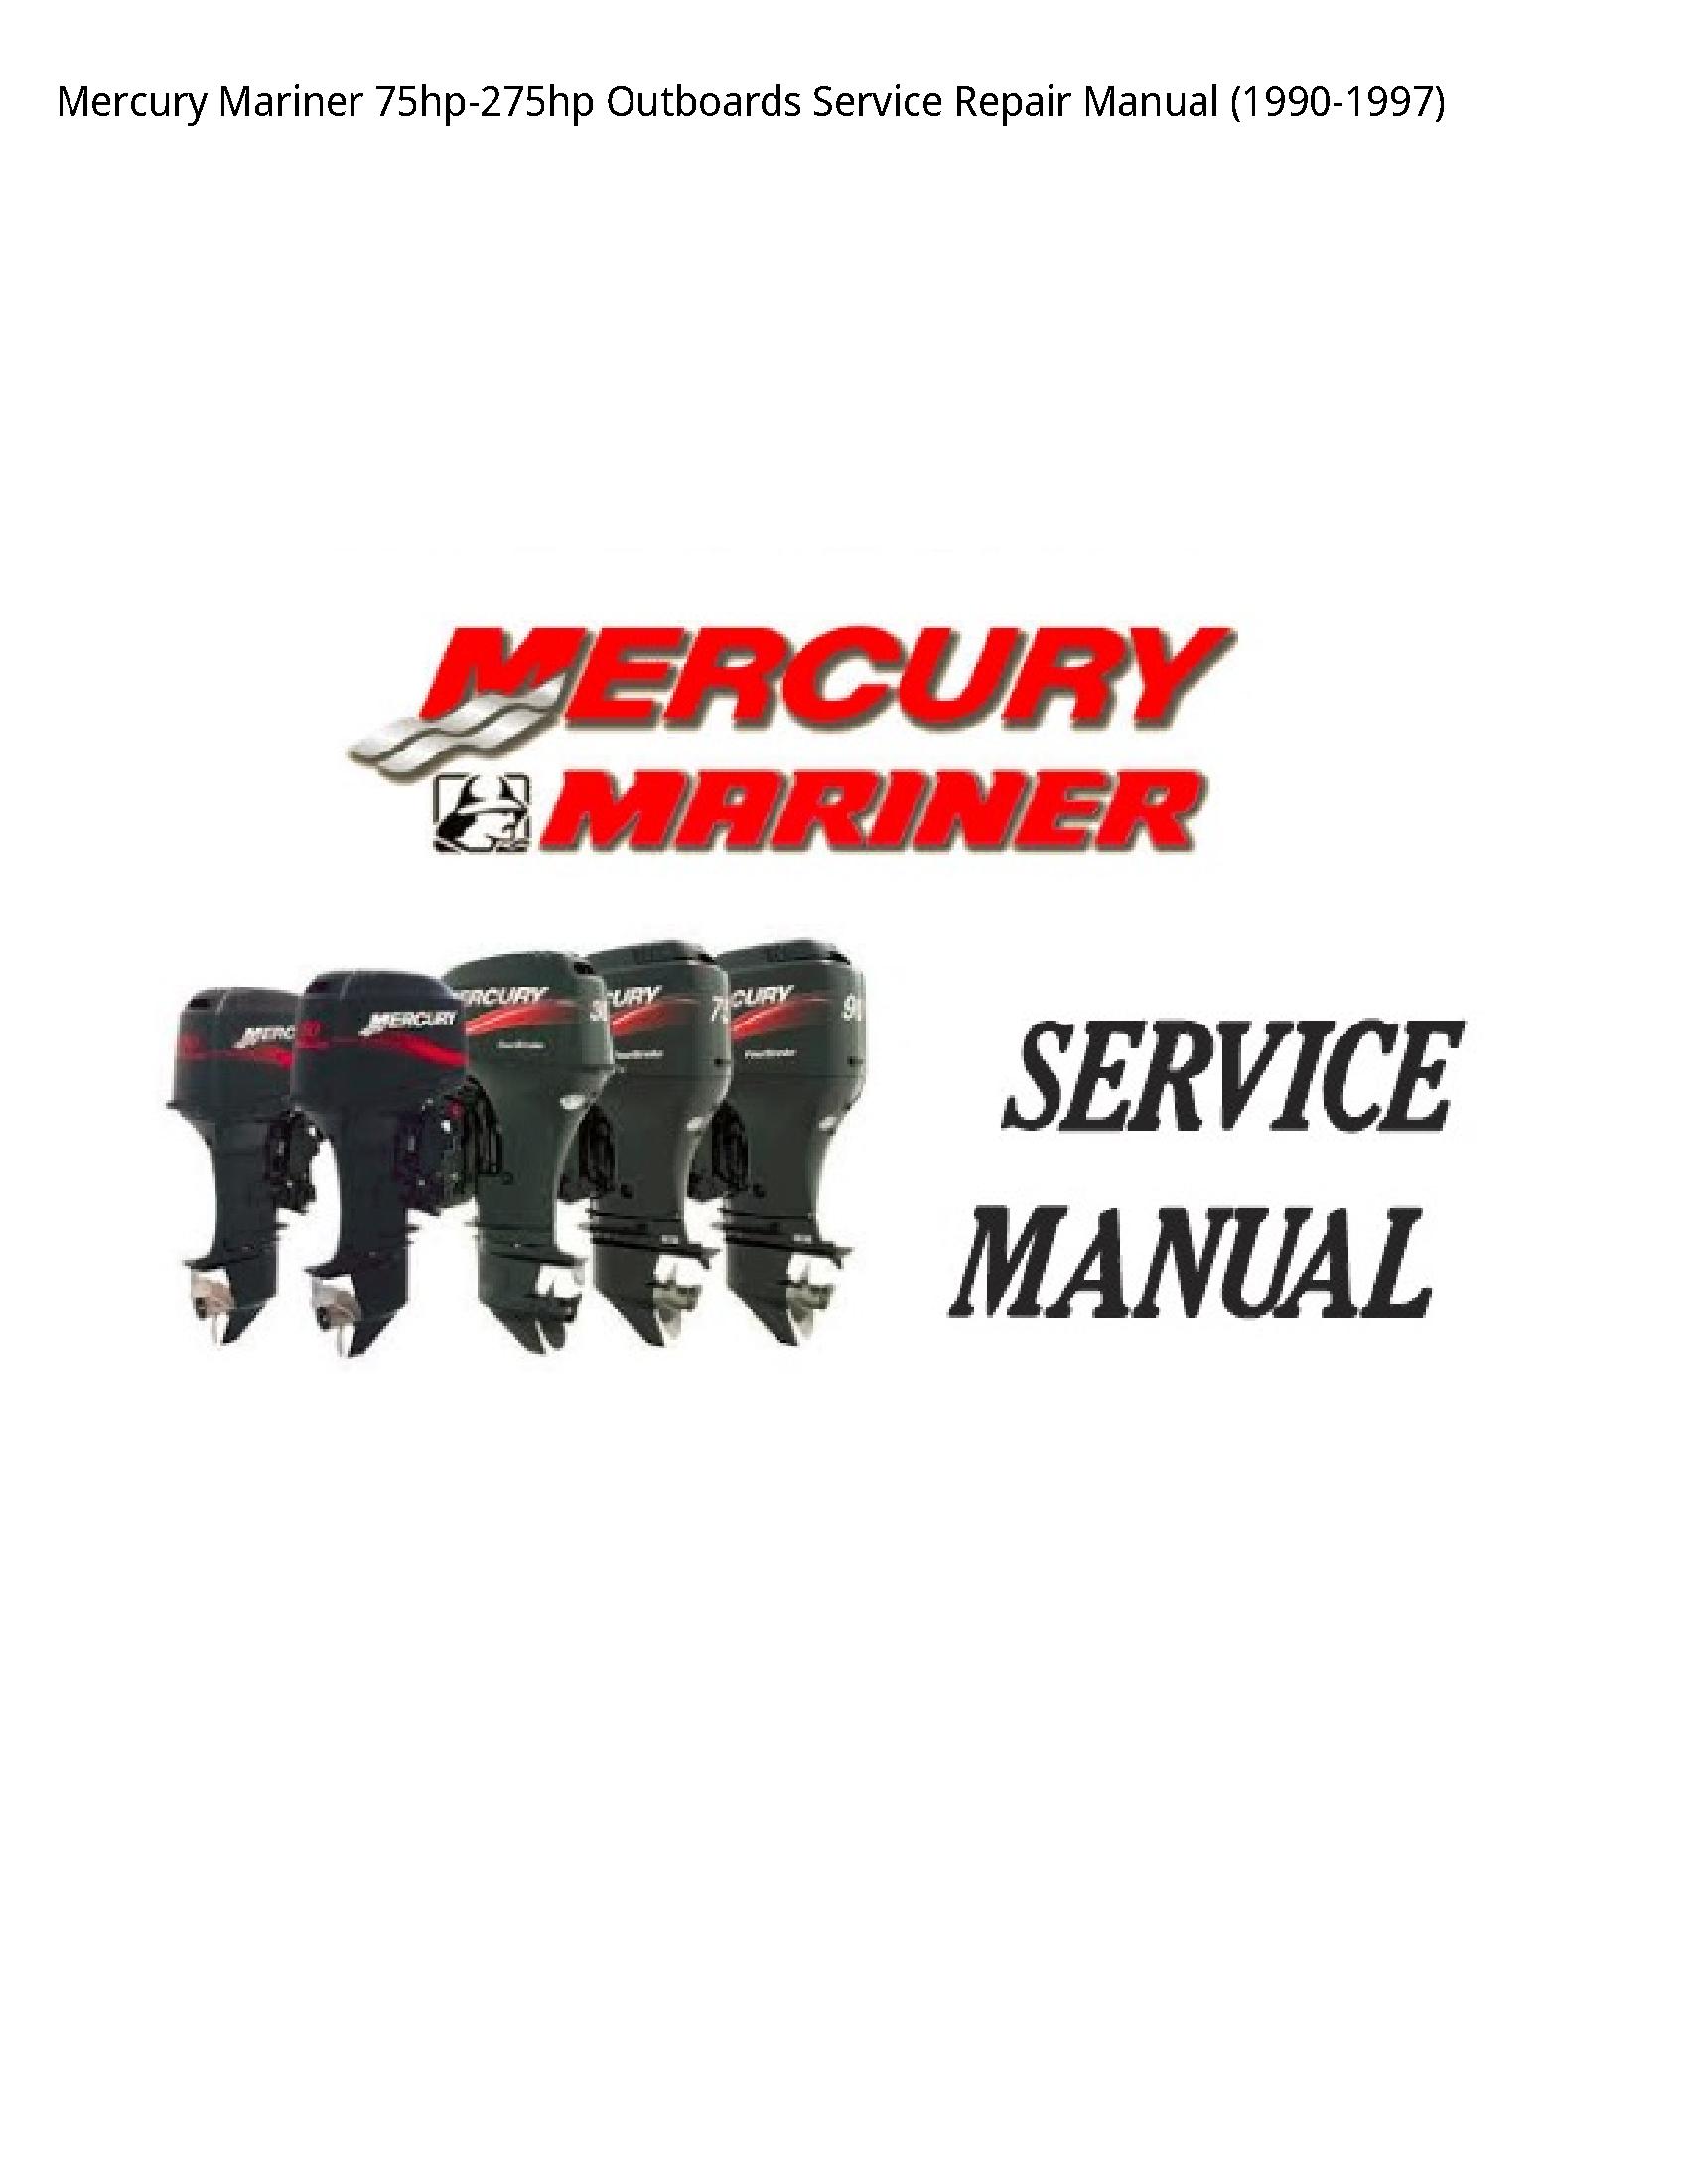 Mercury Mariner 75hp-275hp Outboards manual